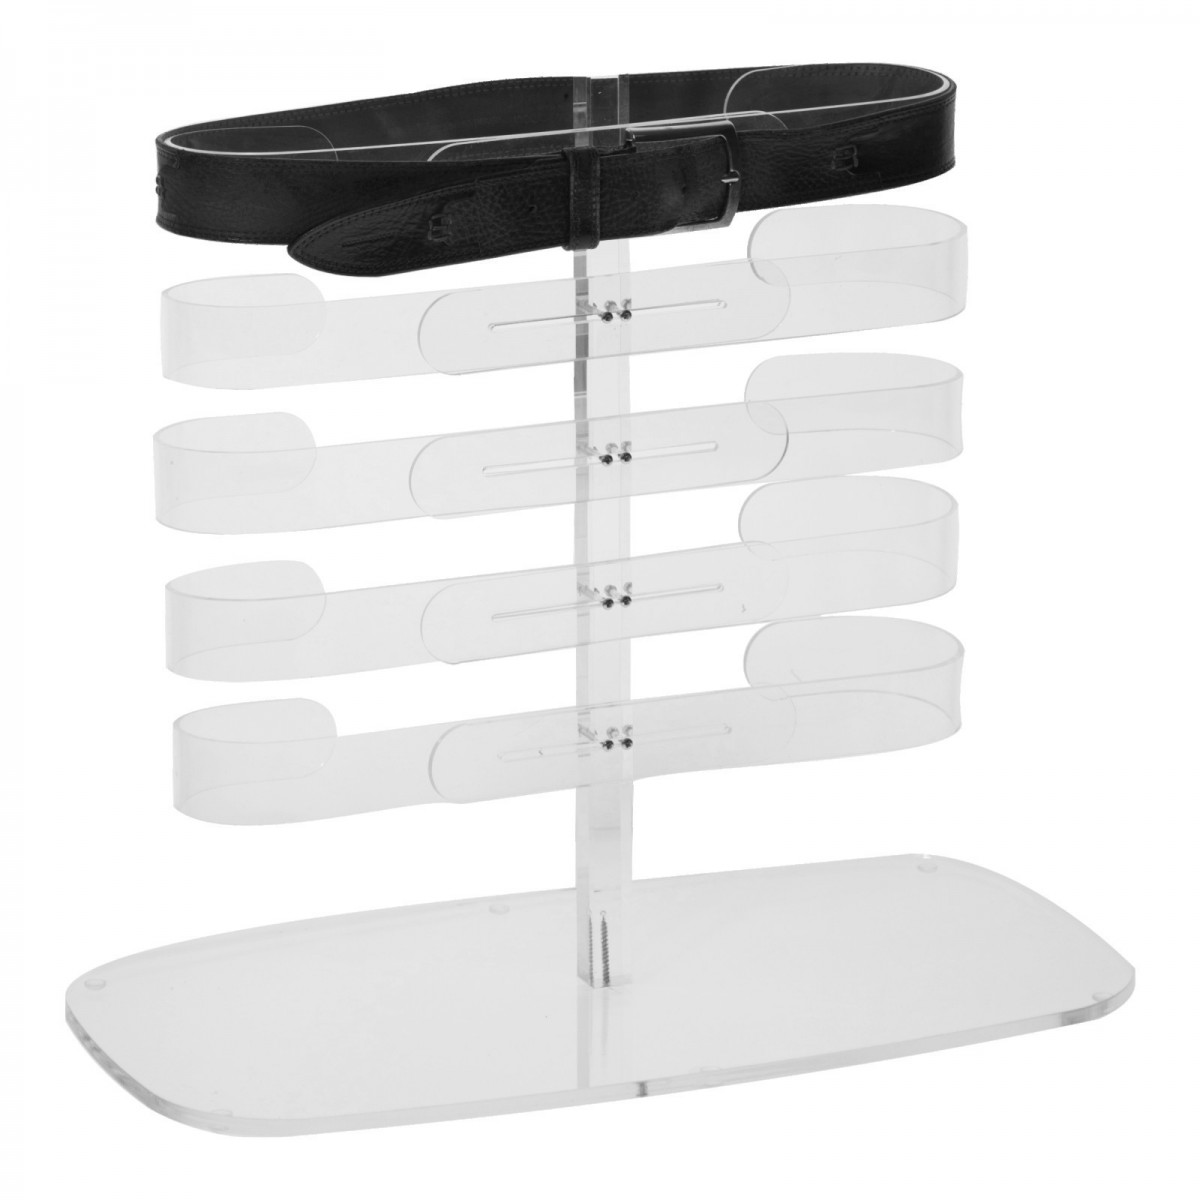 brillendisplay aus plexiglas transparent mit 10 f cher. Black Bedroom Furniture Sets. Home Design Ideas